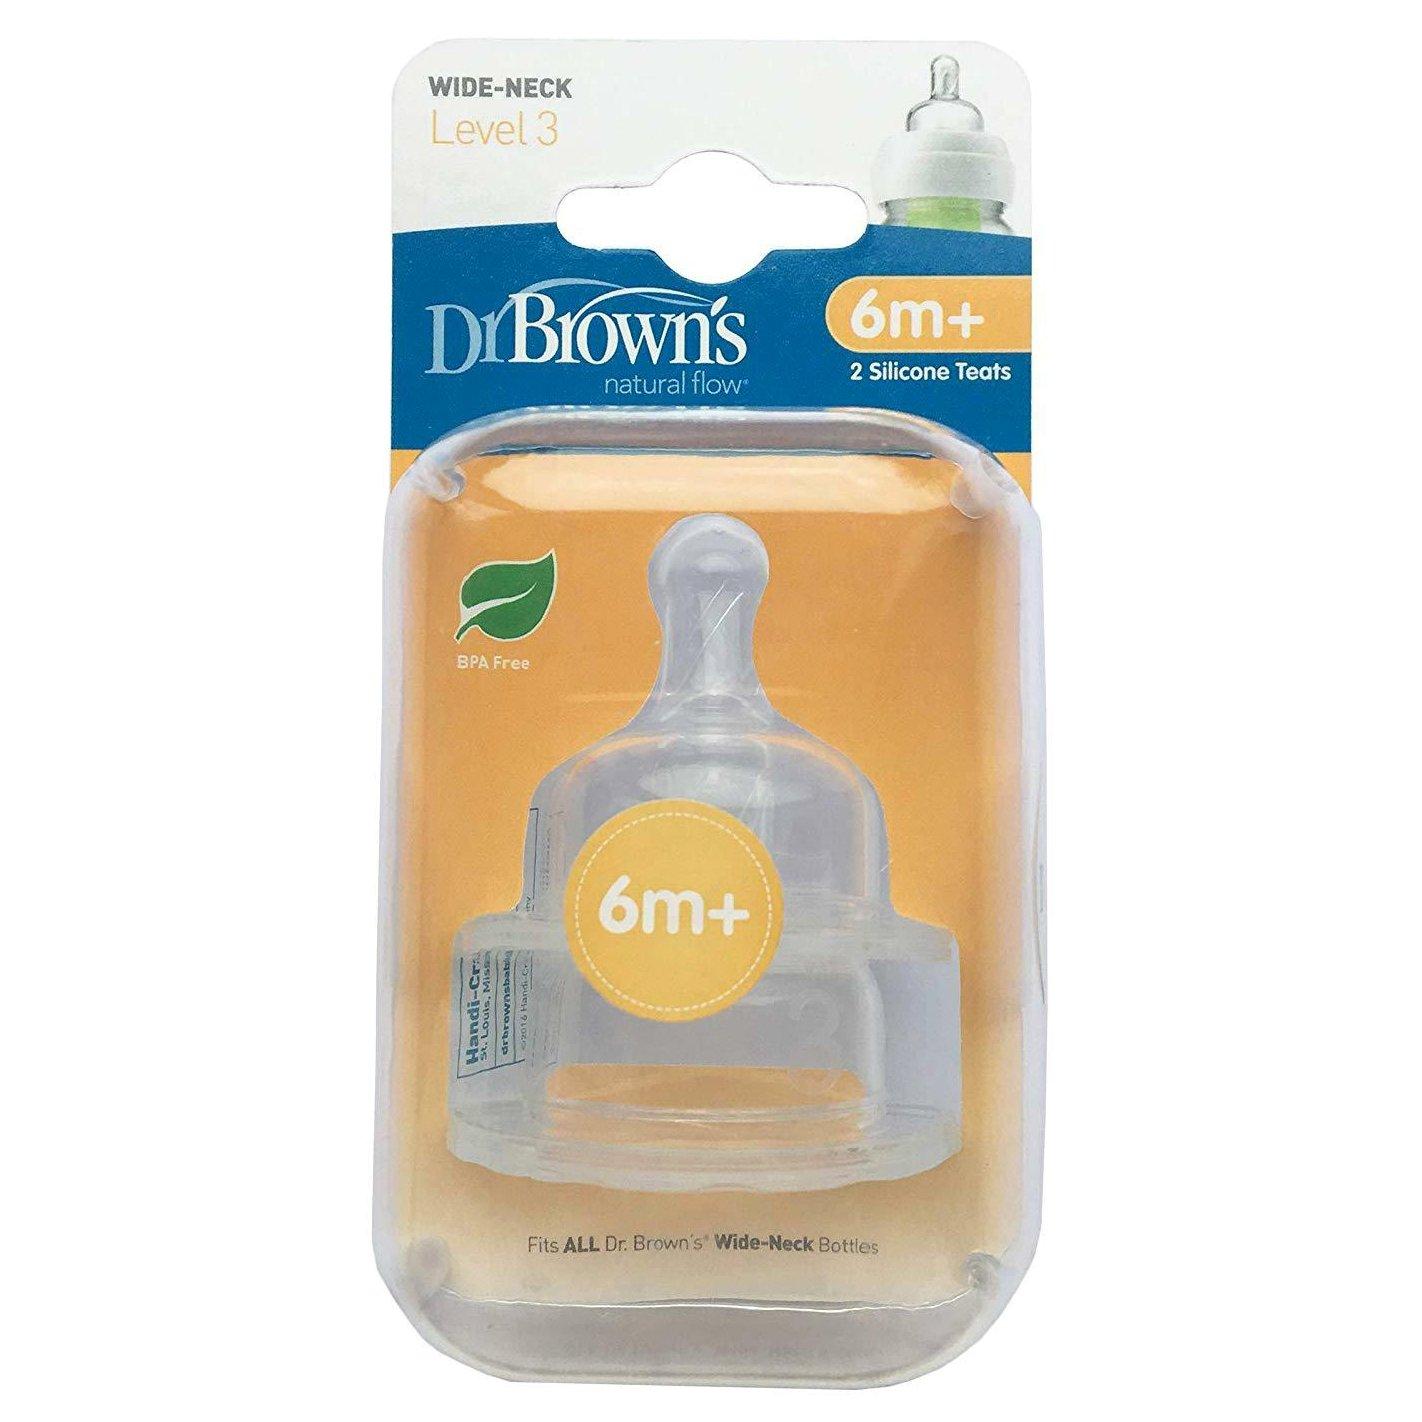 Dr. Browns Options Θηλές Σιλικόνης για Μπιμπερό με Φαρδύ Λαιμό 6m+ 2τμχ